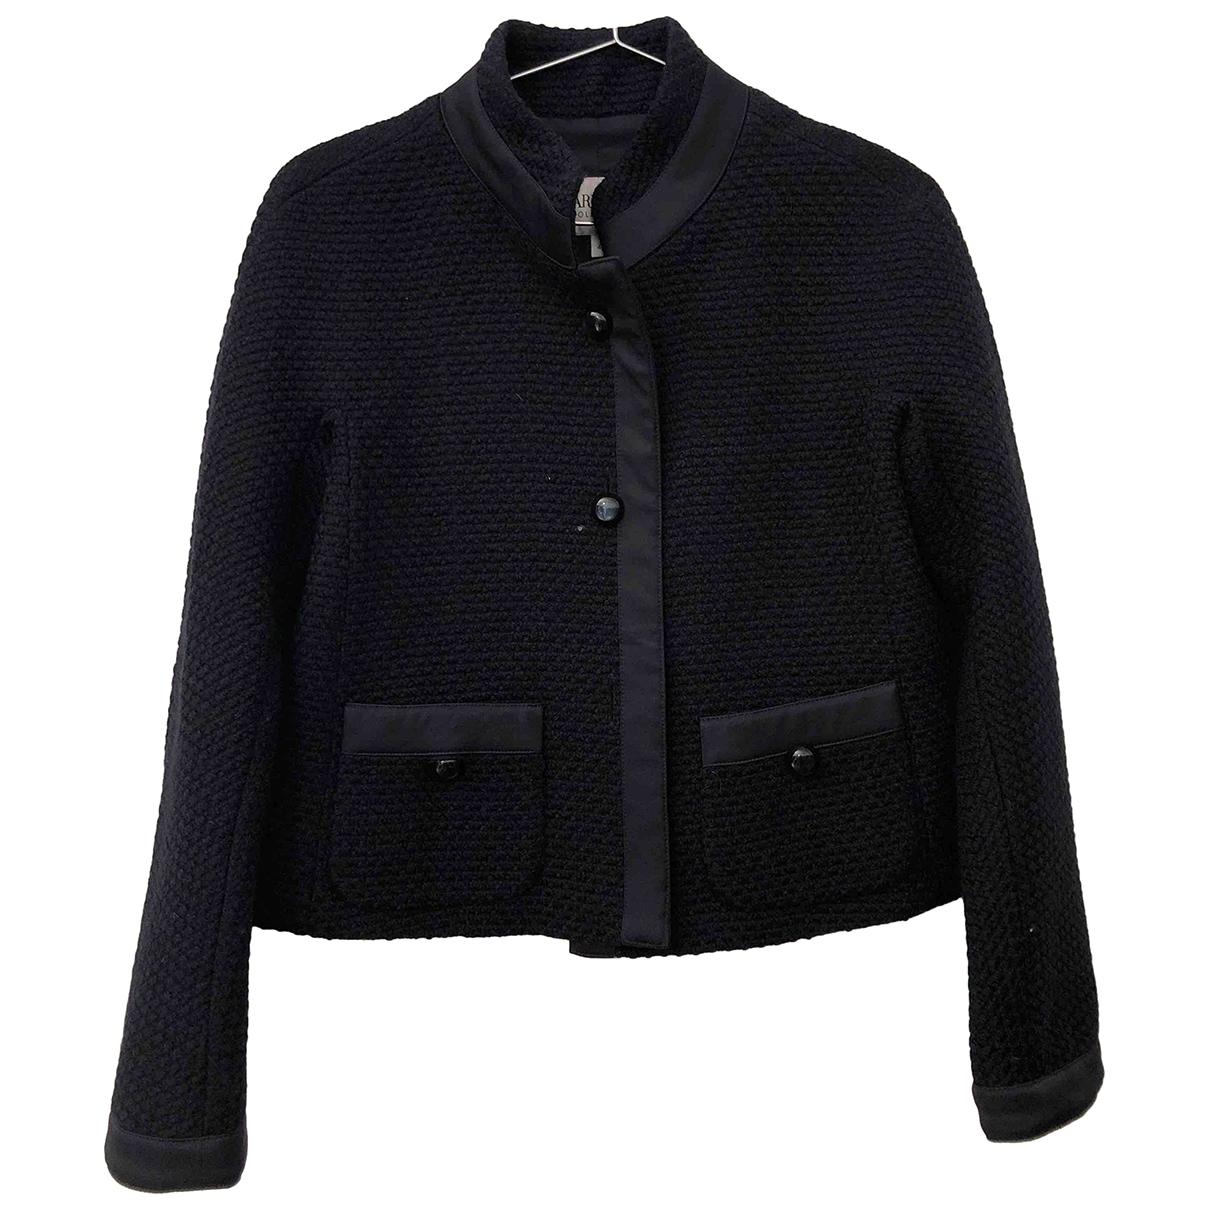 Armani Collezioni \N Jacke in  Blau Wolle